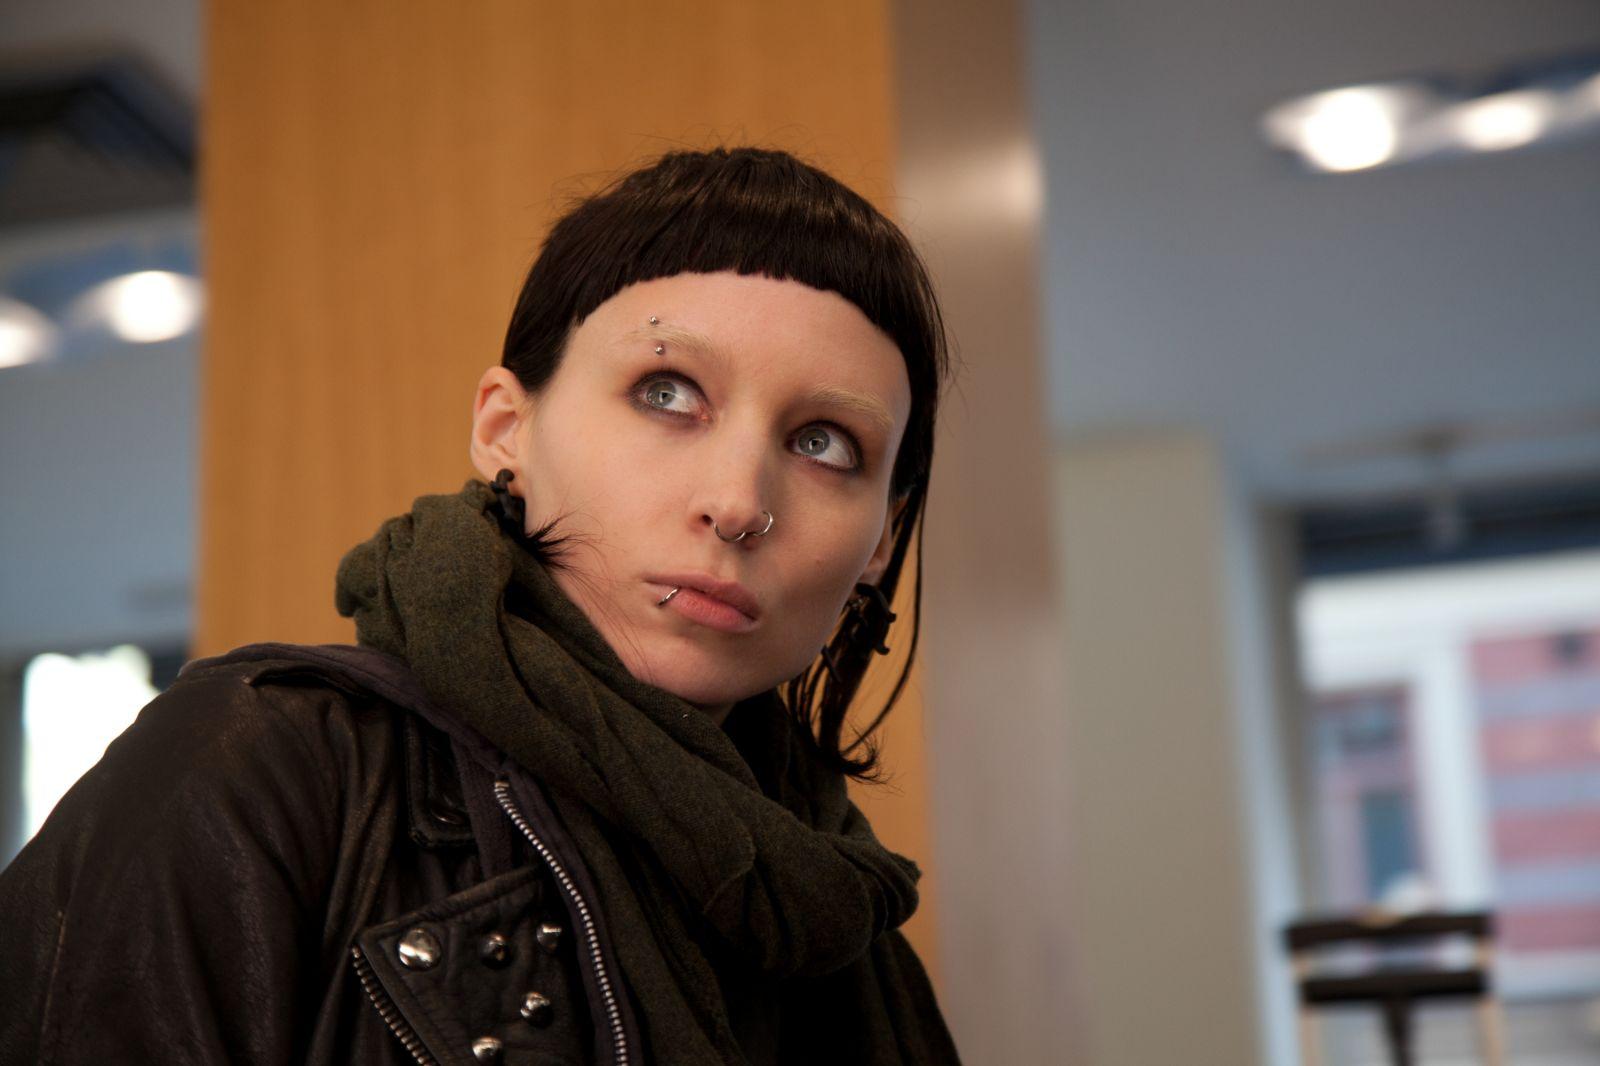 http://4.bp.blogspot.com/-2stixLOQOi0/Tuo8gYpbuyI/AAAAAAAAI7Y/wk6Zz4QlOPE/s1600/2011_the_girl_with_the_dragon_tattoo_001.jpg